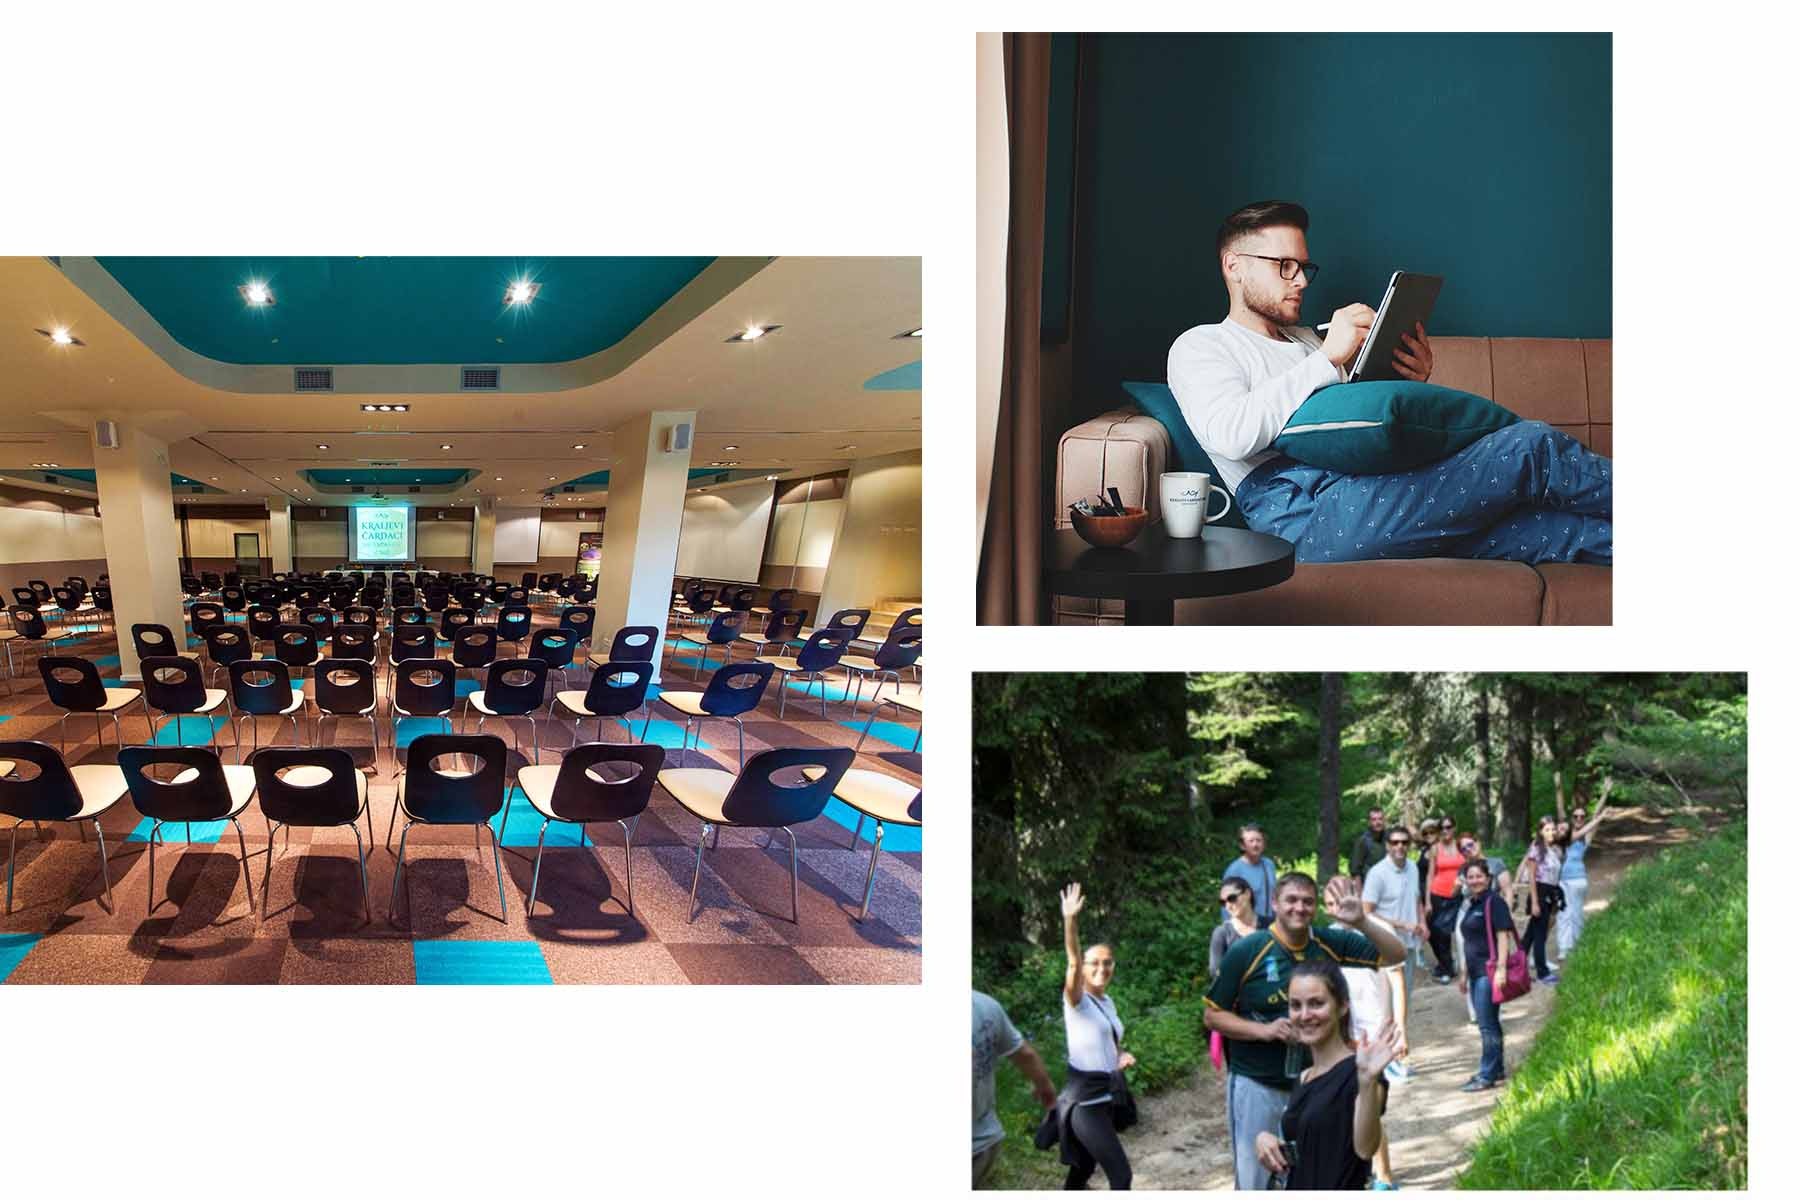 https://kraljevicardaci.com/wp-content/uploads/2021/03/kongres-vizual-home.jpg